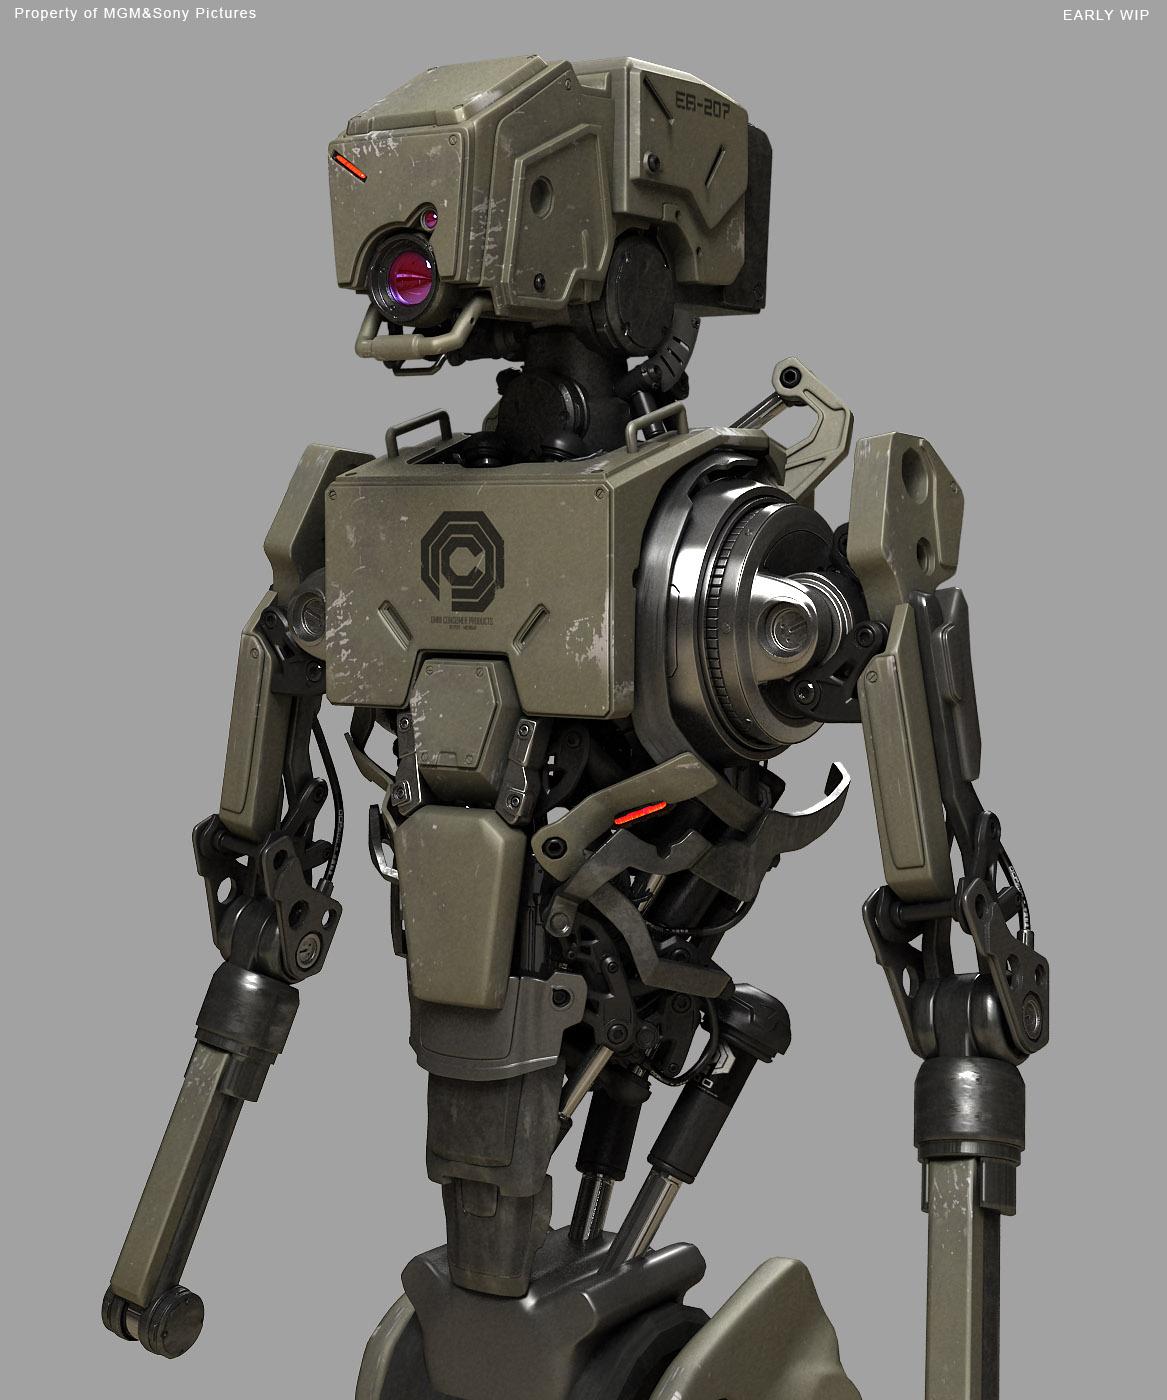 Robocop_Illustration_EB207_V02_TurnTable_FDeMartini_020234.jpg